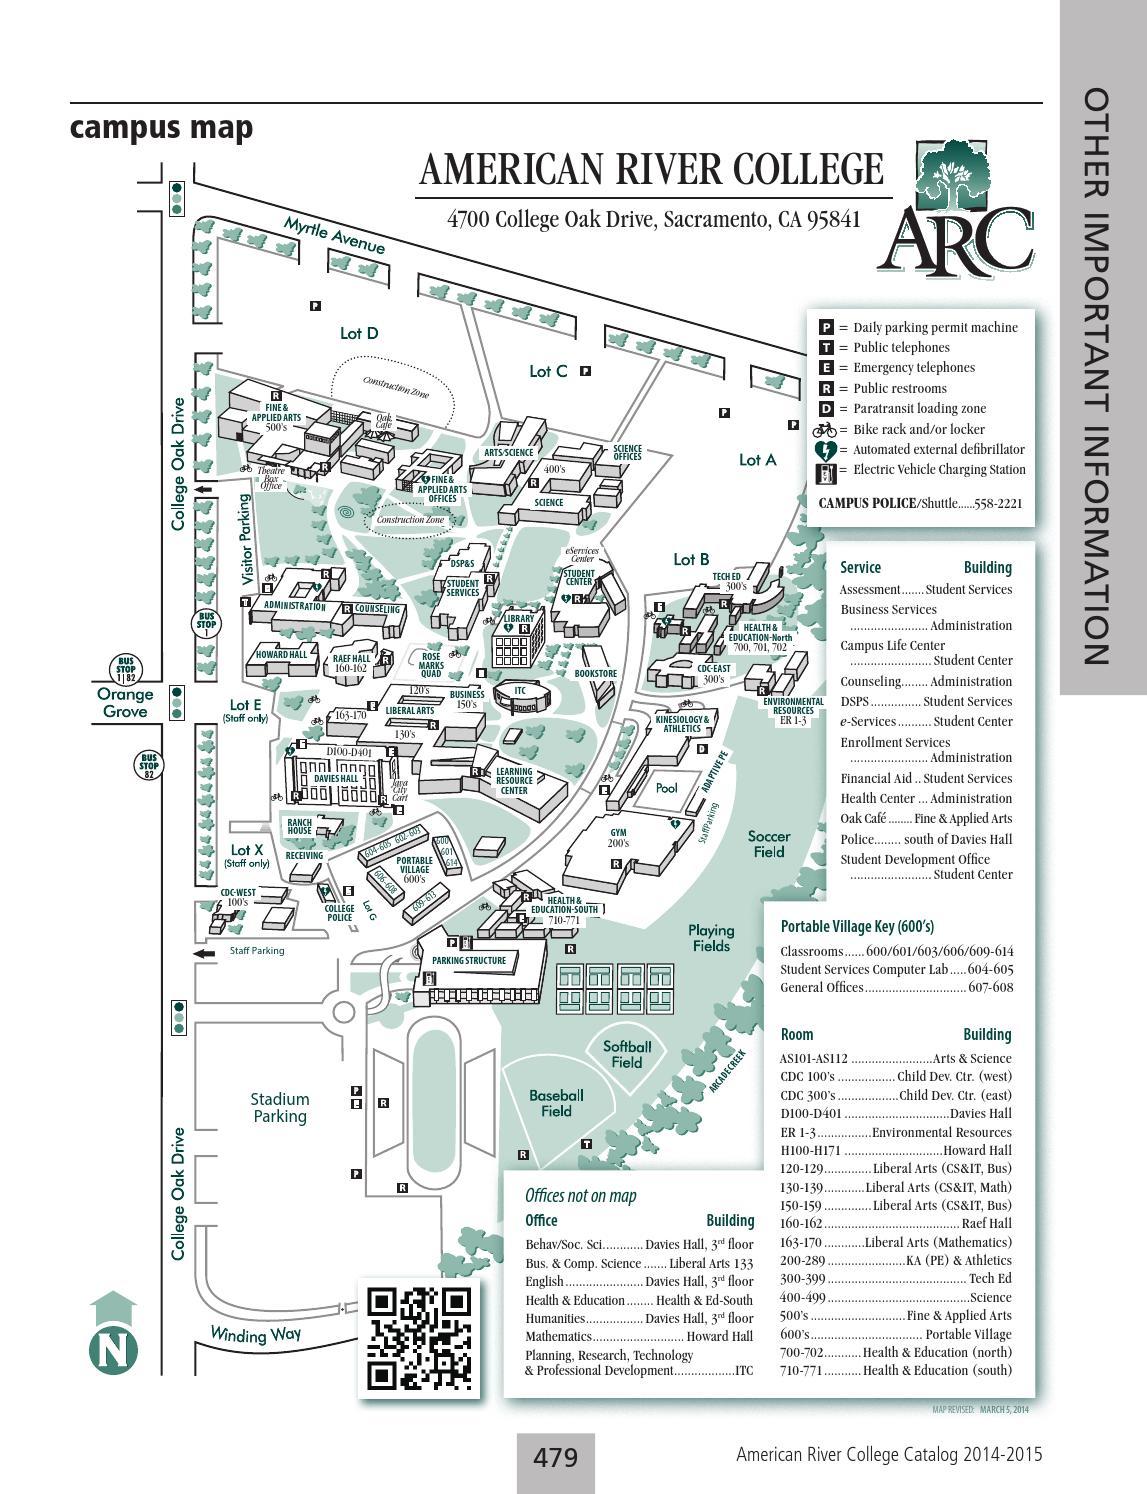 Deaf Culture and ASL Studies - American River College